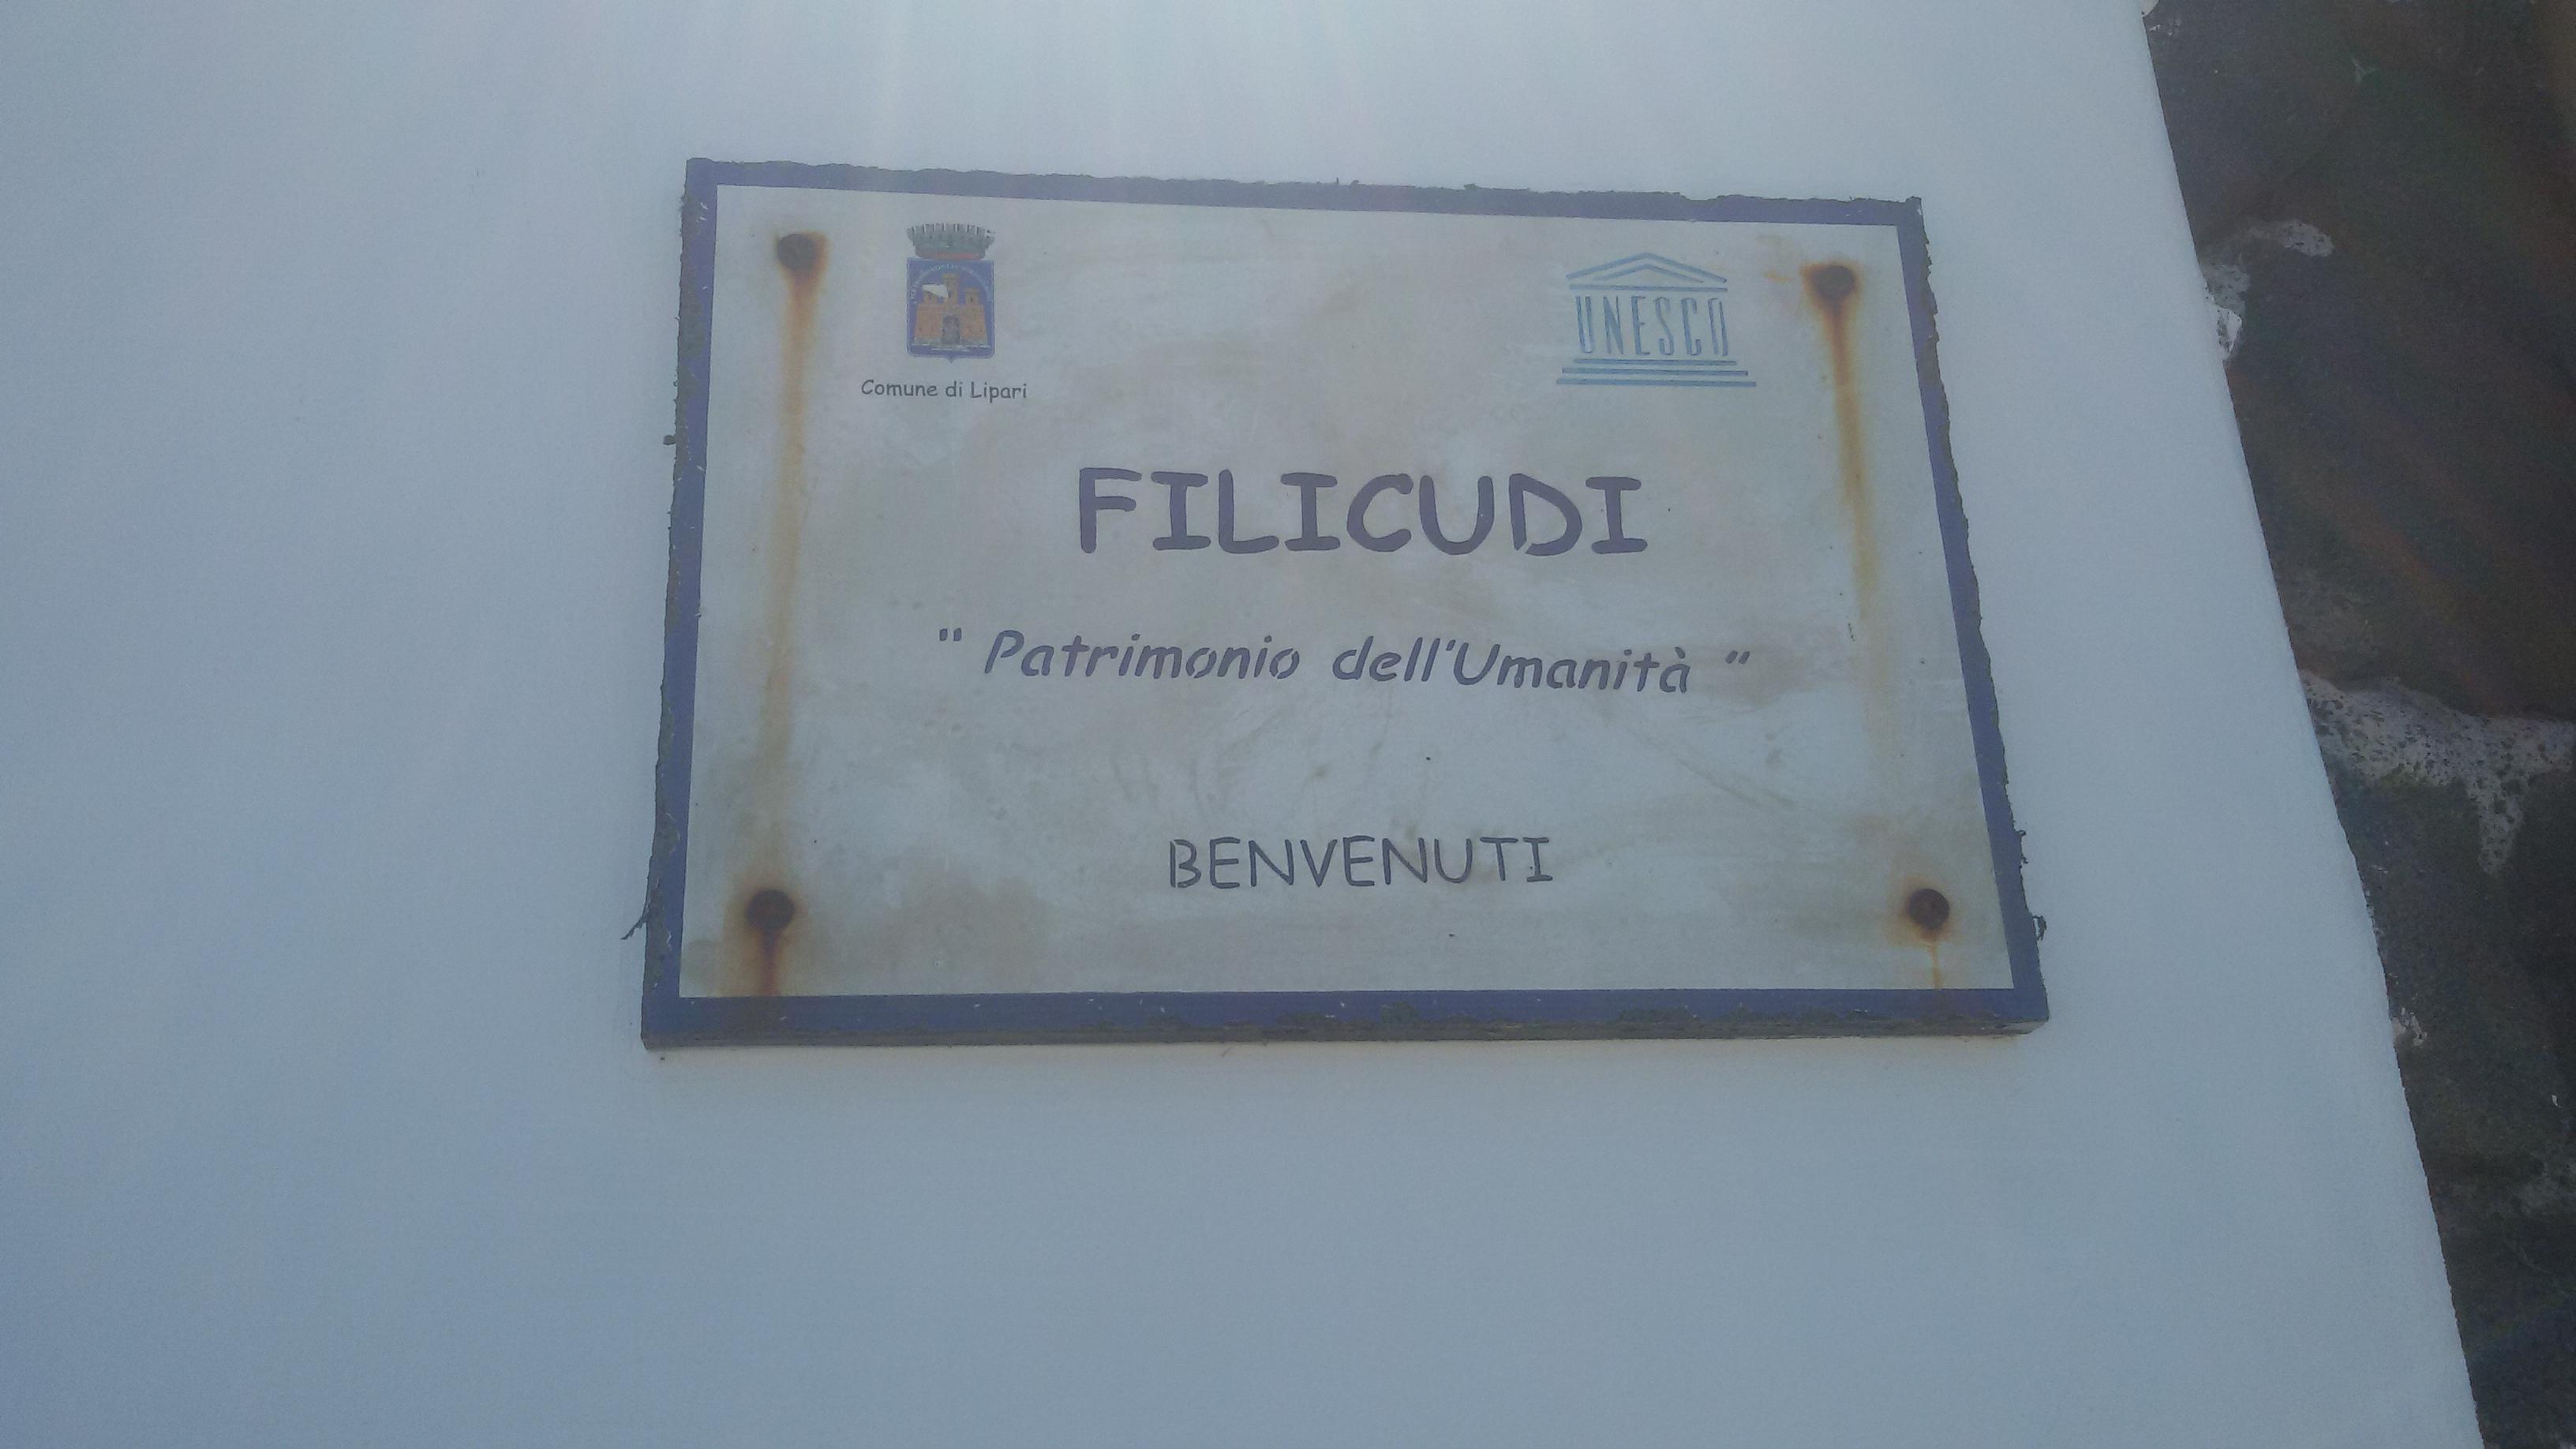 FILICUDI